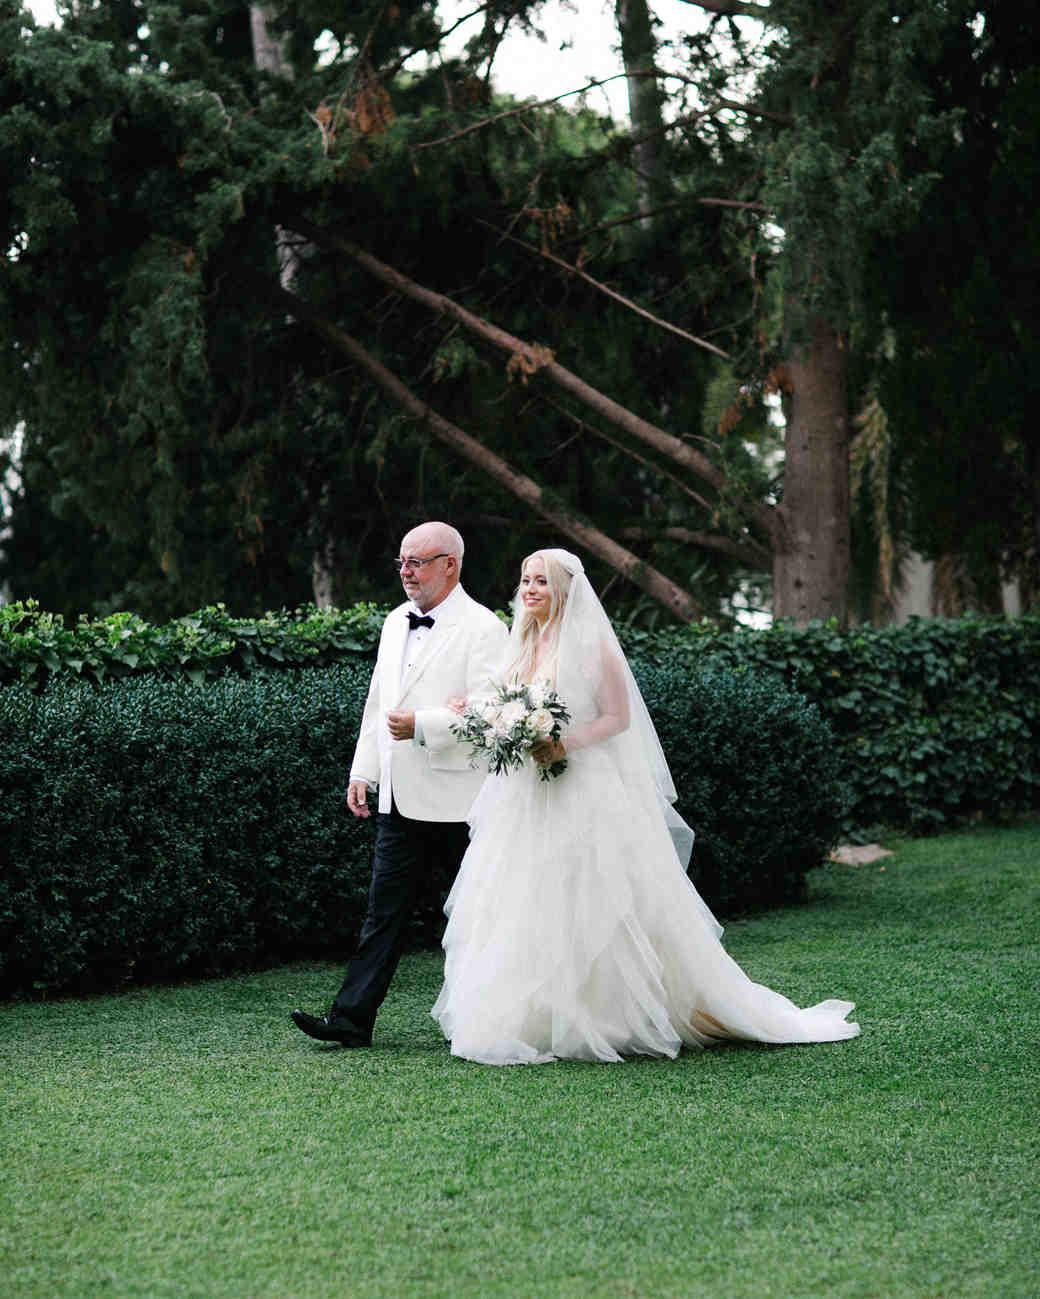 melissa-mike-wedding-dad-0158-s112764-0316.jpg